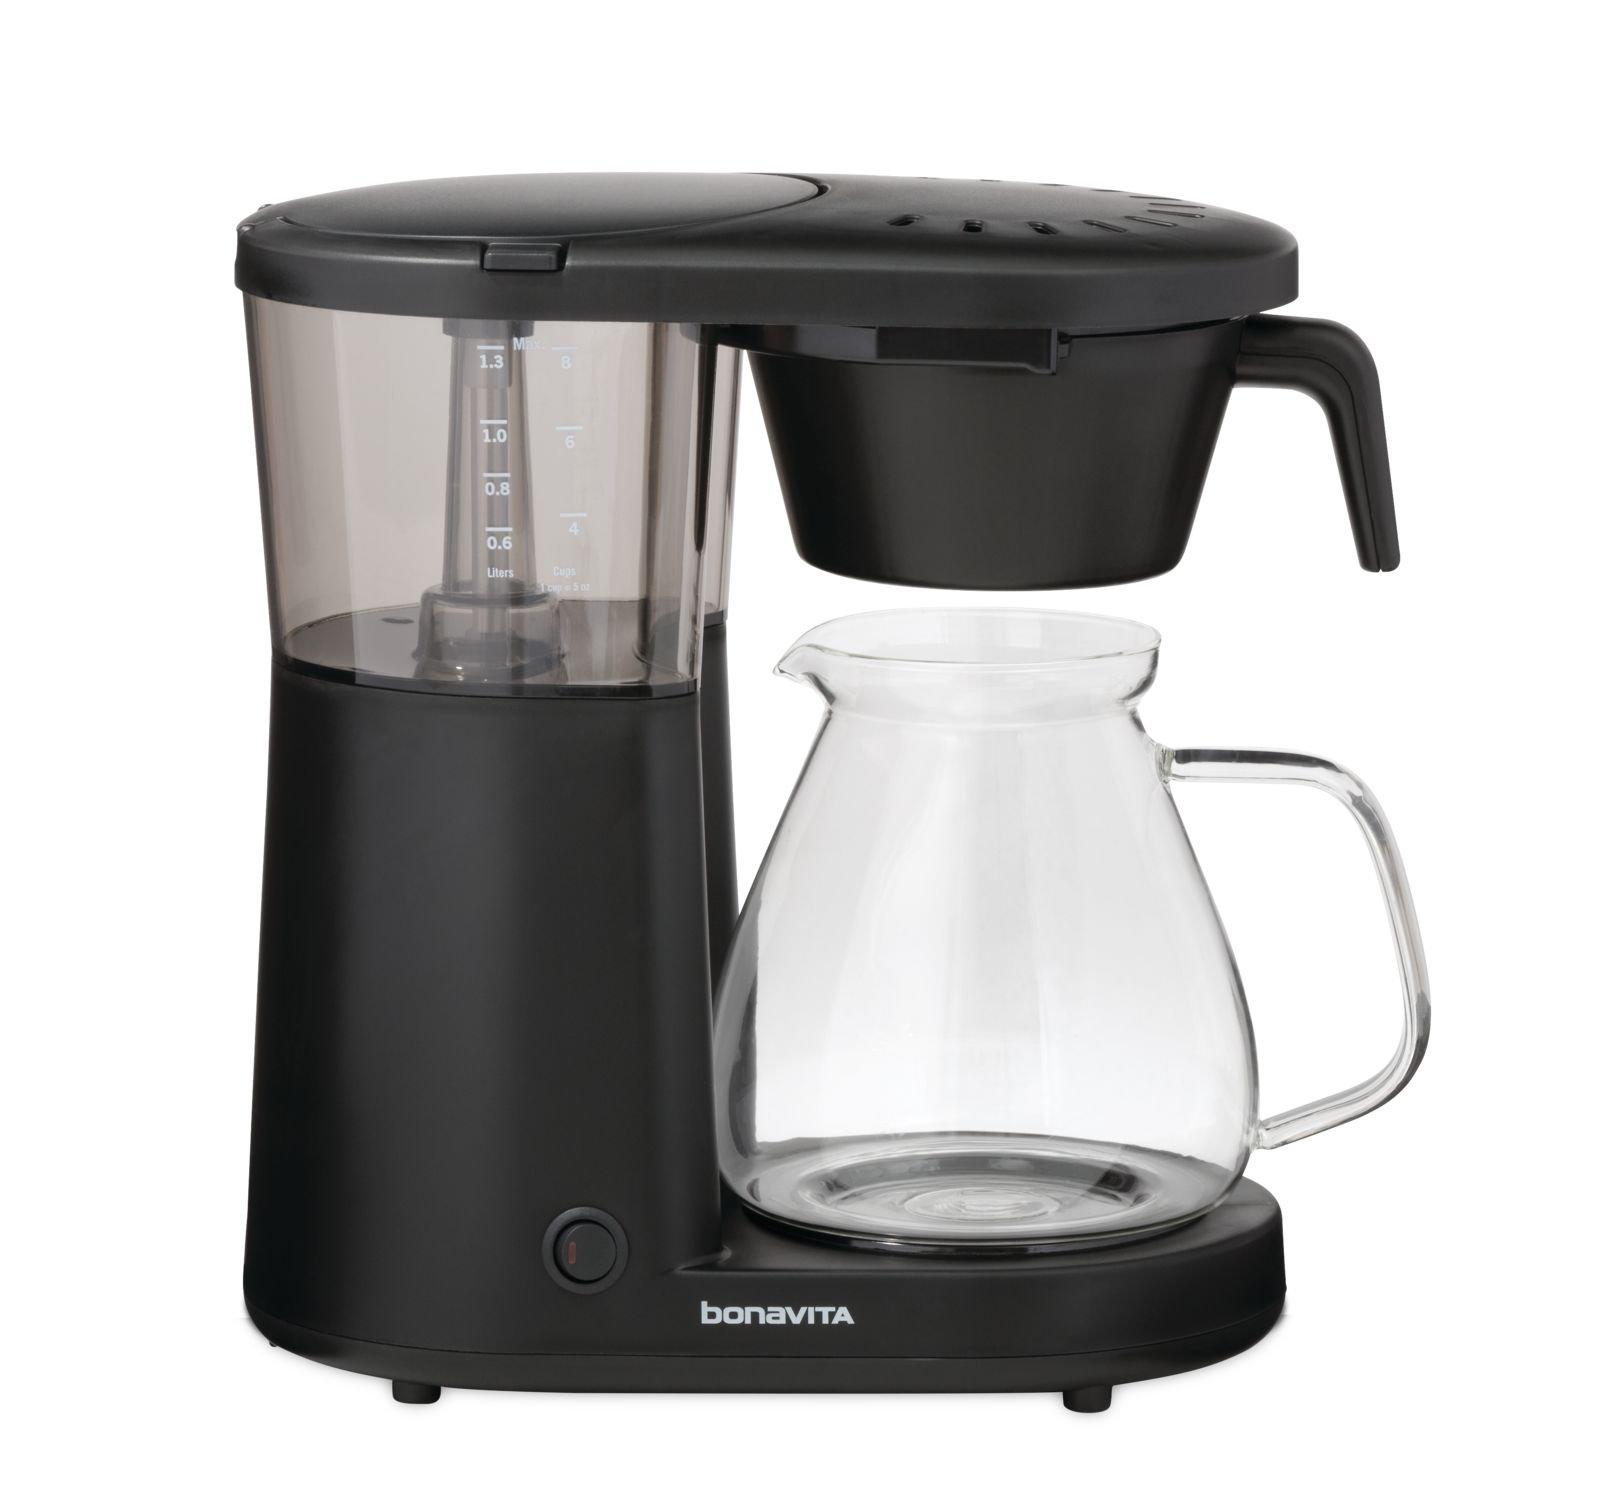 Bonavita BV1901PW Budget Coffee Maker